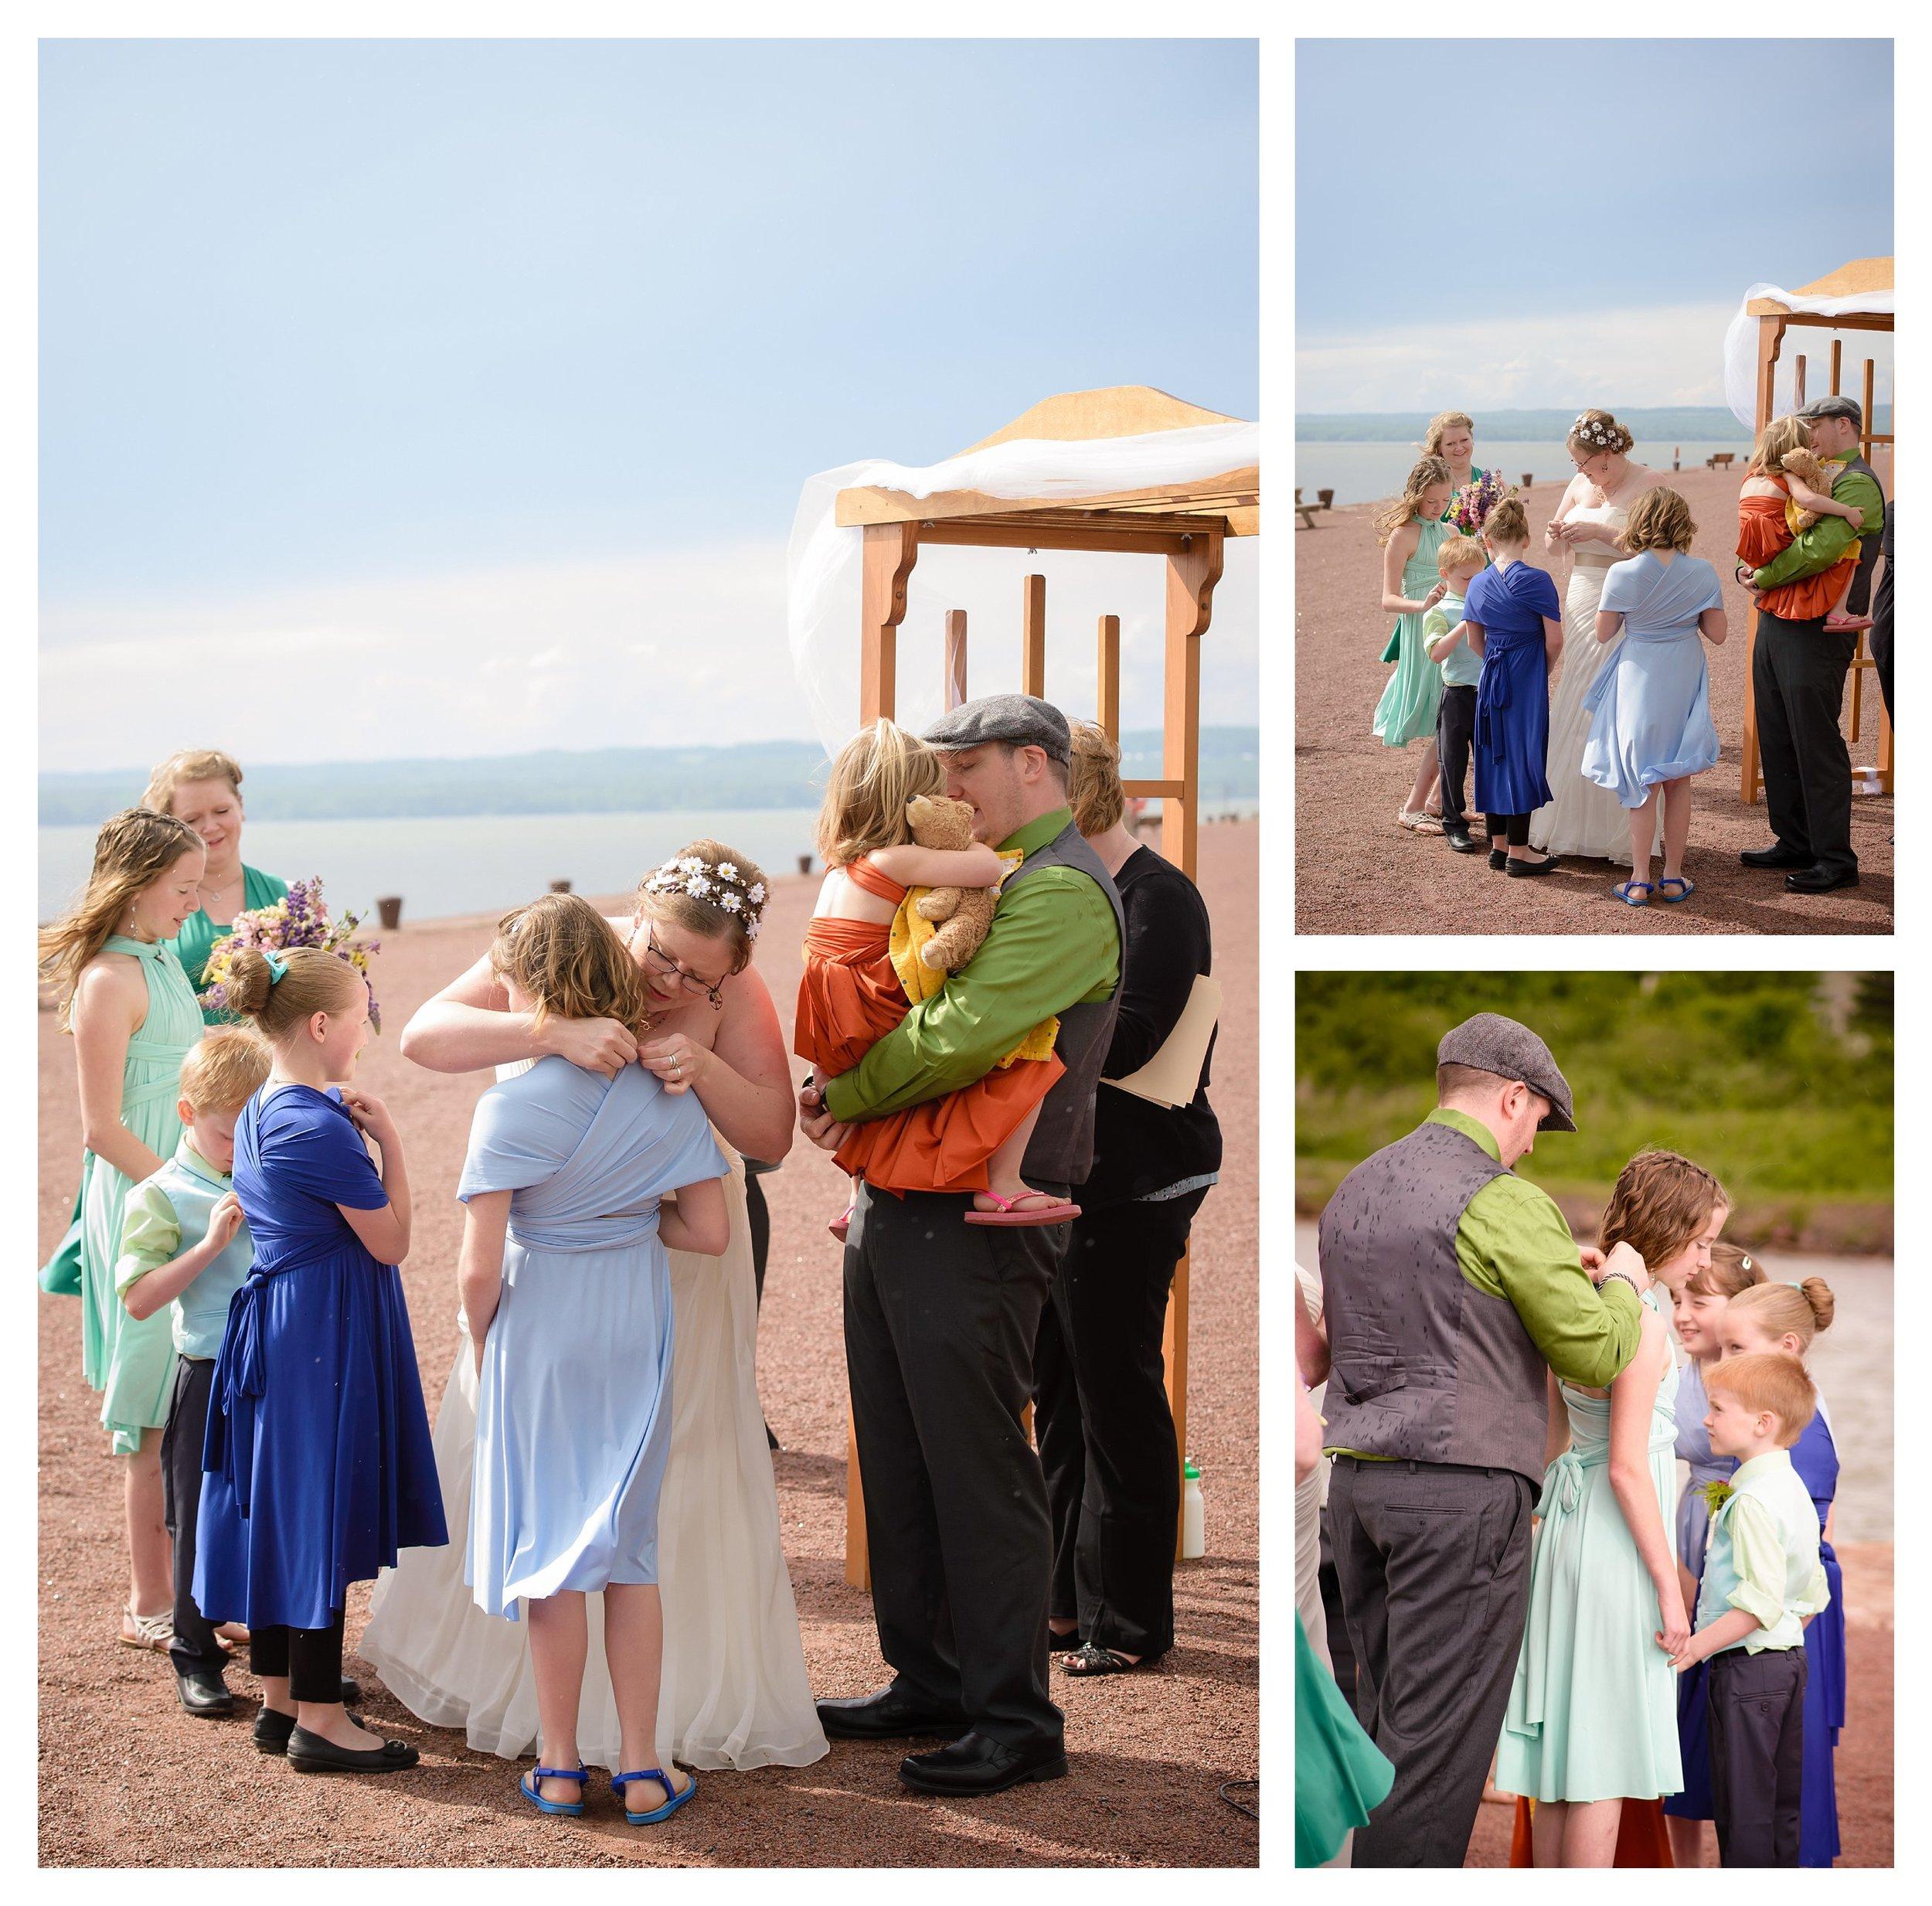 ashland oredock northwoods wisconsin wedding ps 139 photography_0287.jpg